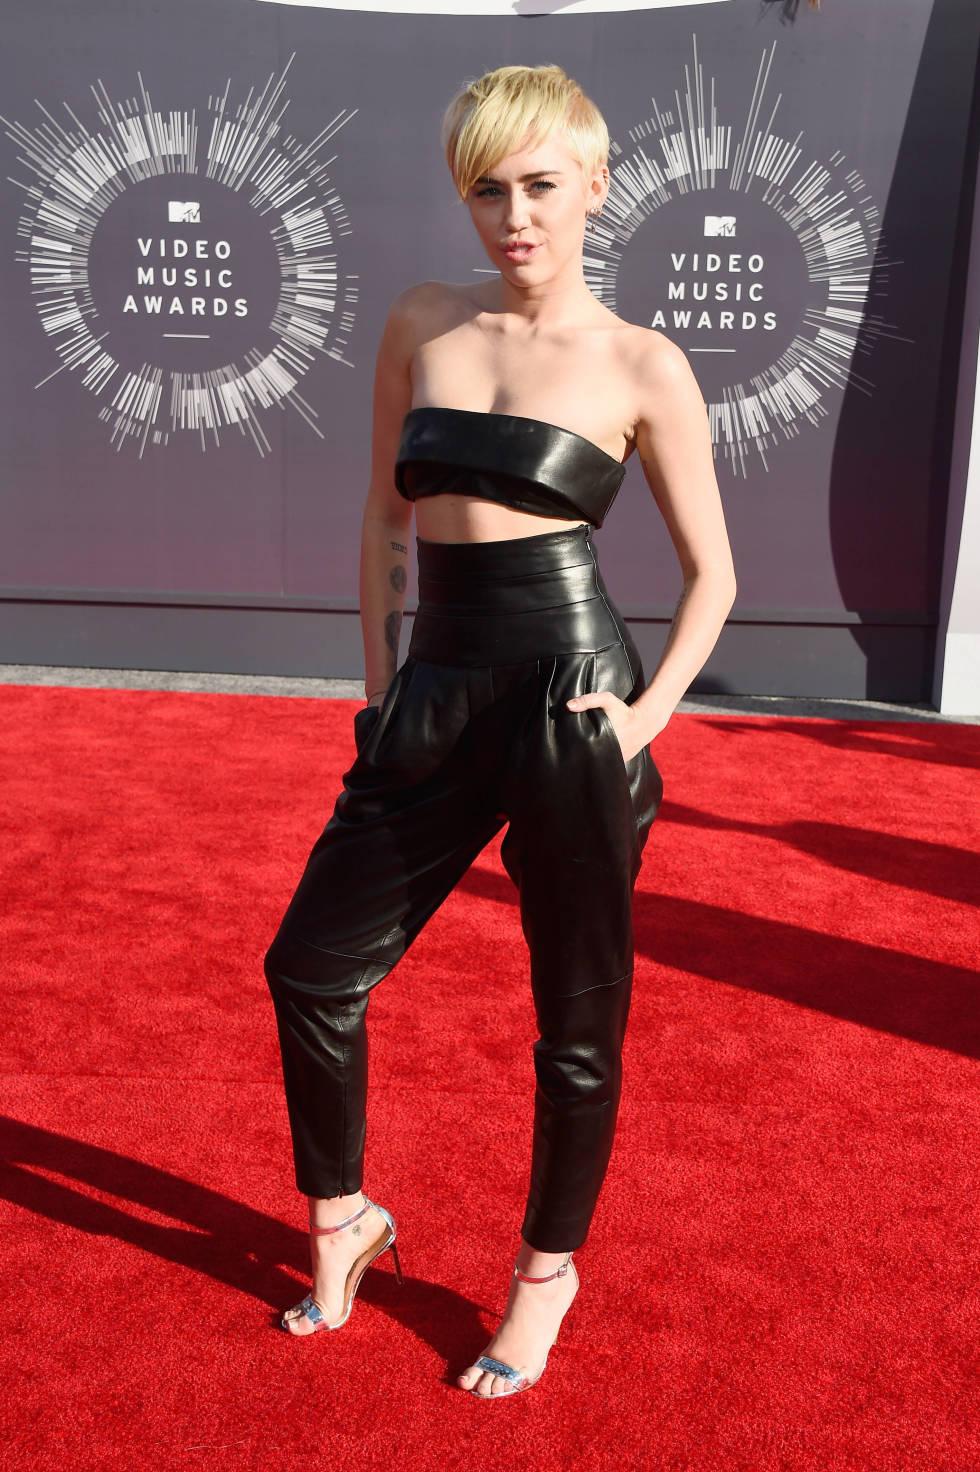 Miley Cyrus - 2014 MTV Video Music Awards (Foto: Reprodução)